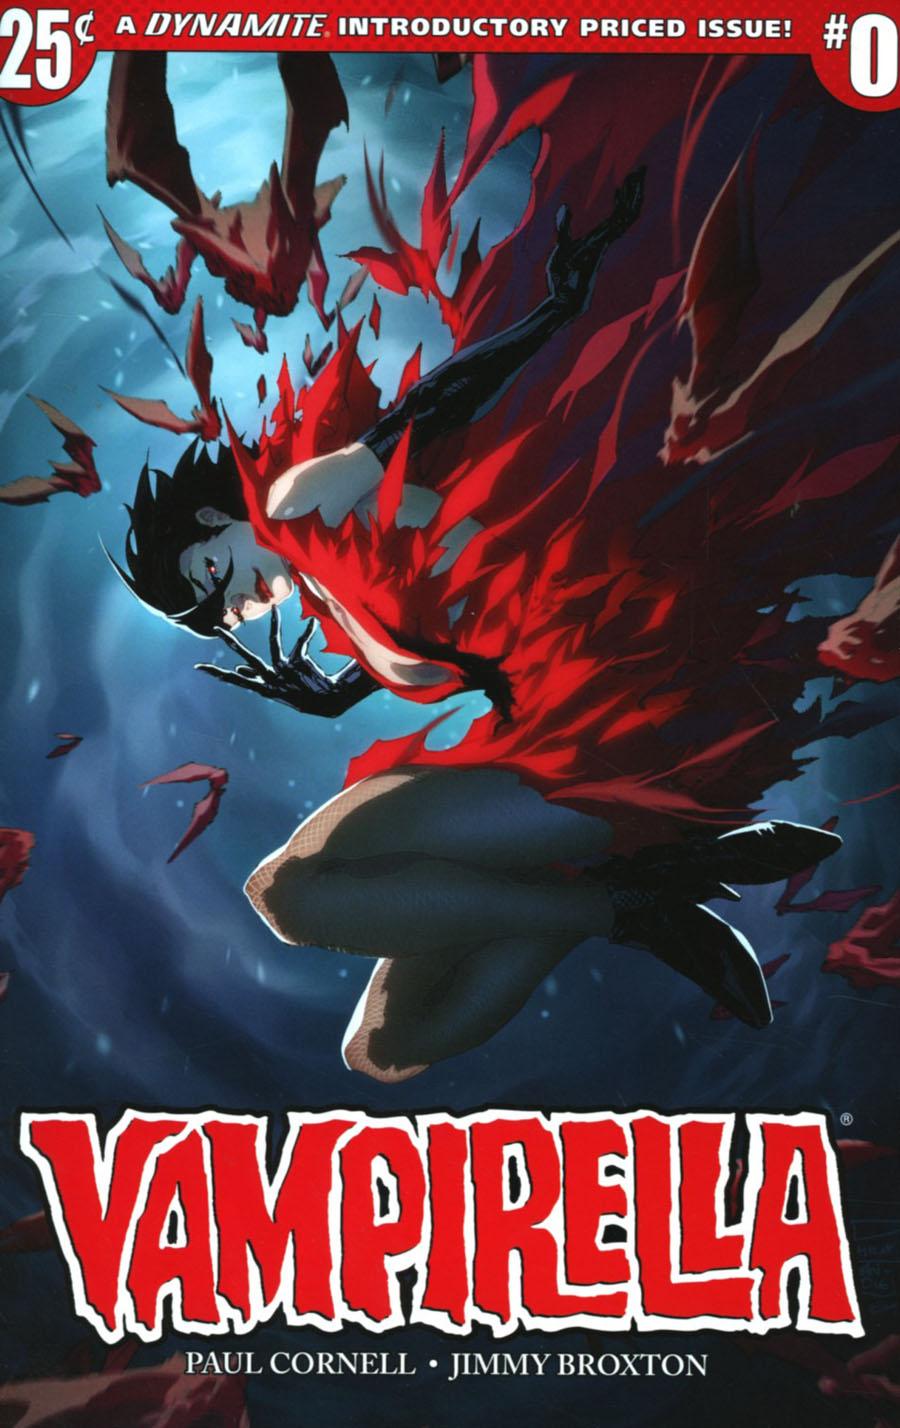 Vampirella Vol 7 #0 Cover A Regular Philip Tan Cover